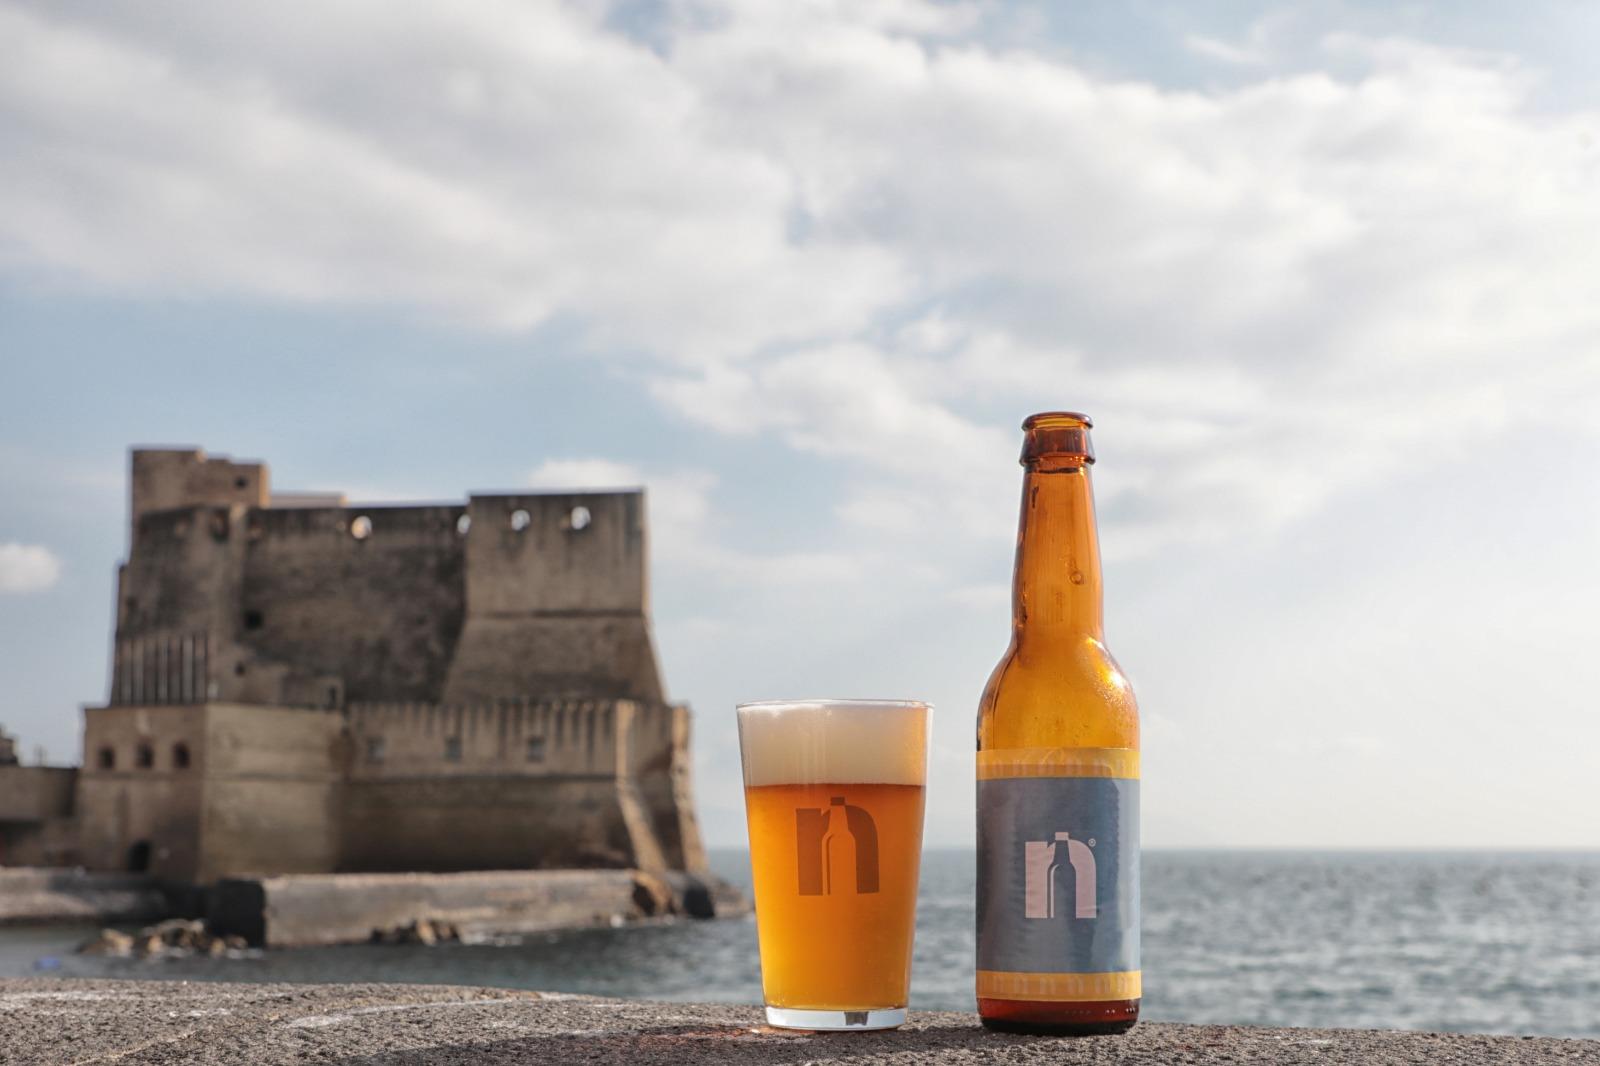 Napoli beerfest